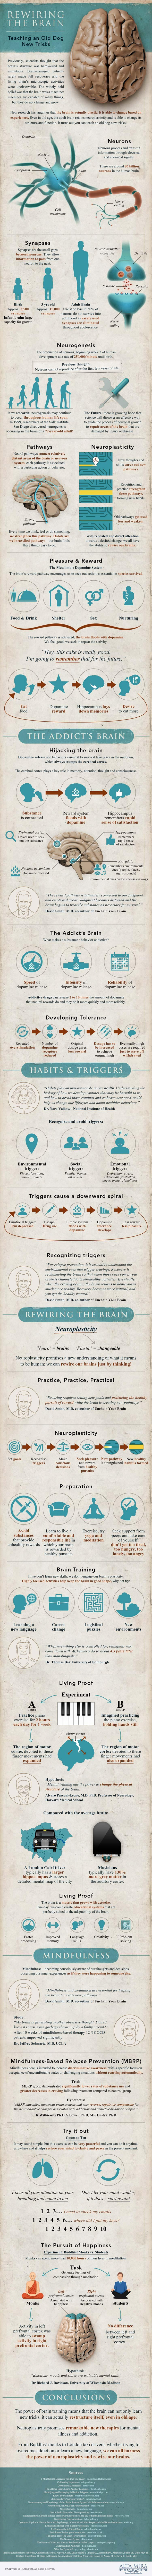 Rewiring_the_Brain_Infographic